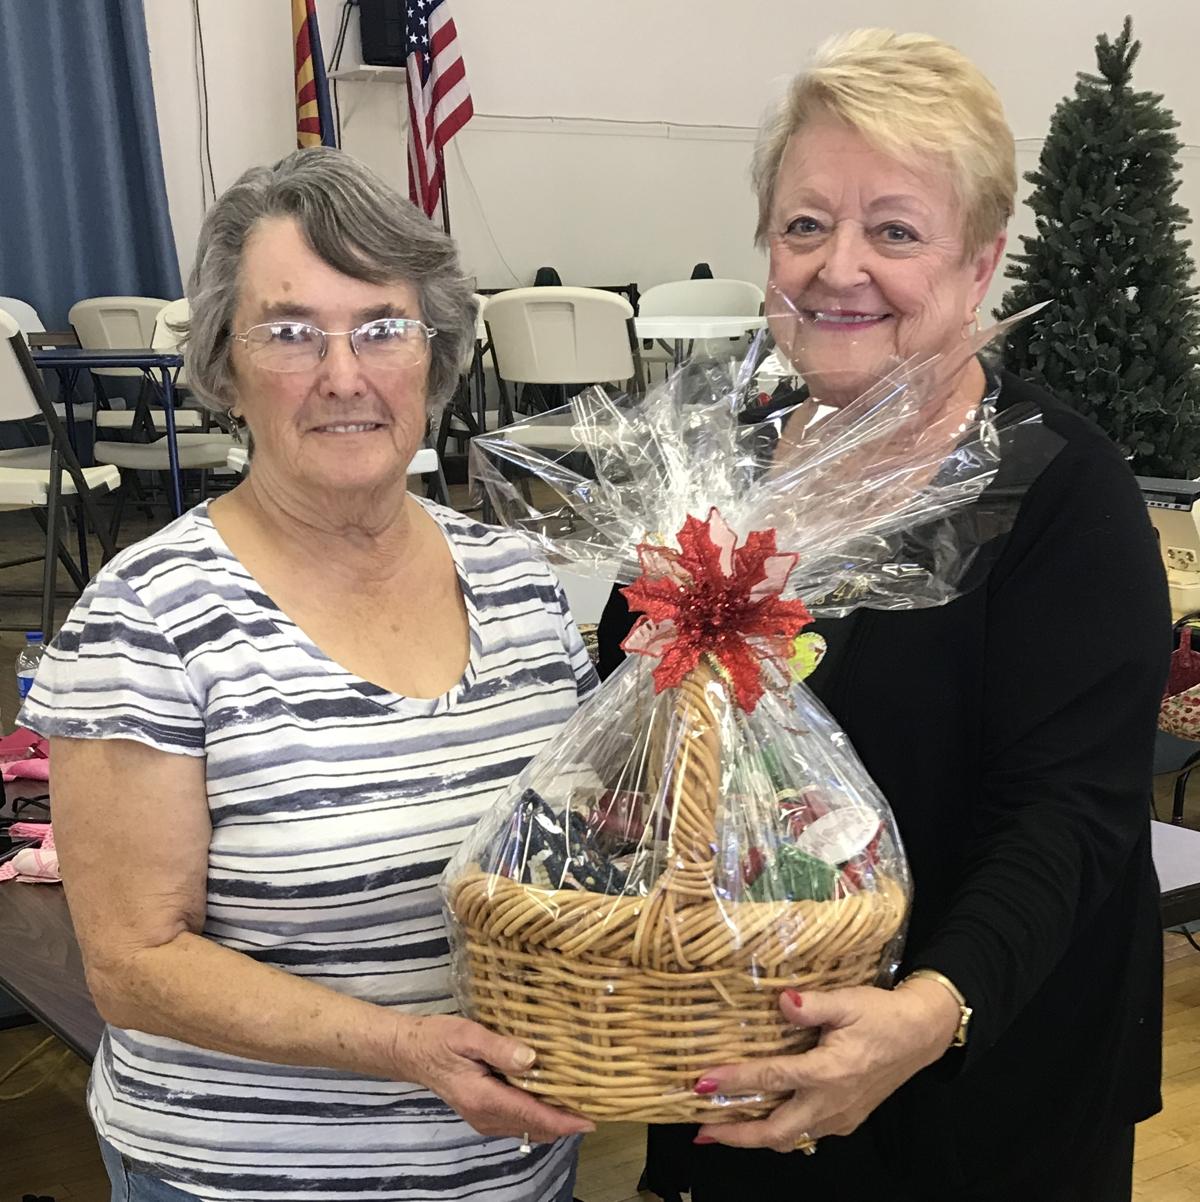 Janet Grabowski wins raffle basket